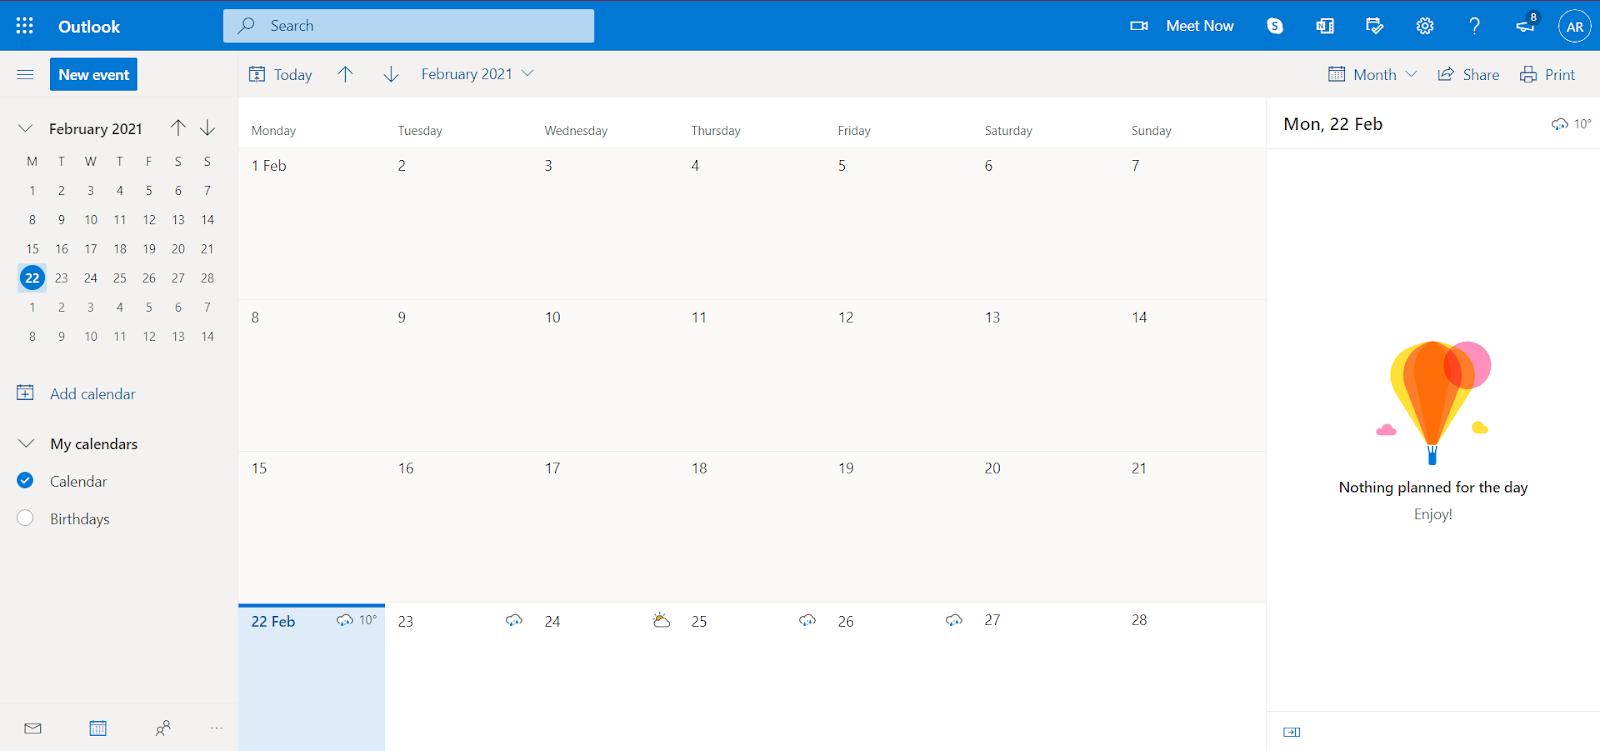 Create a new calendar in outlook